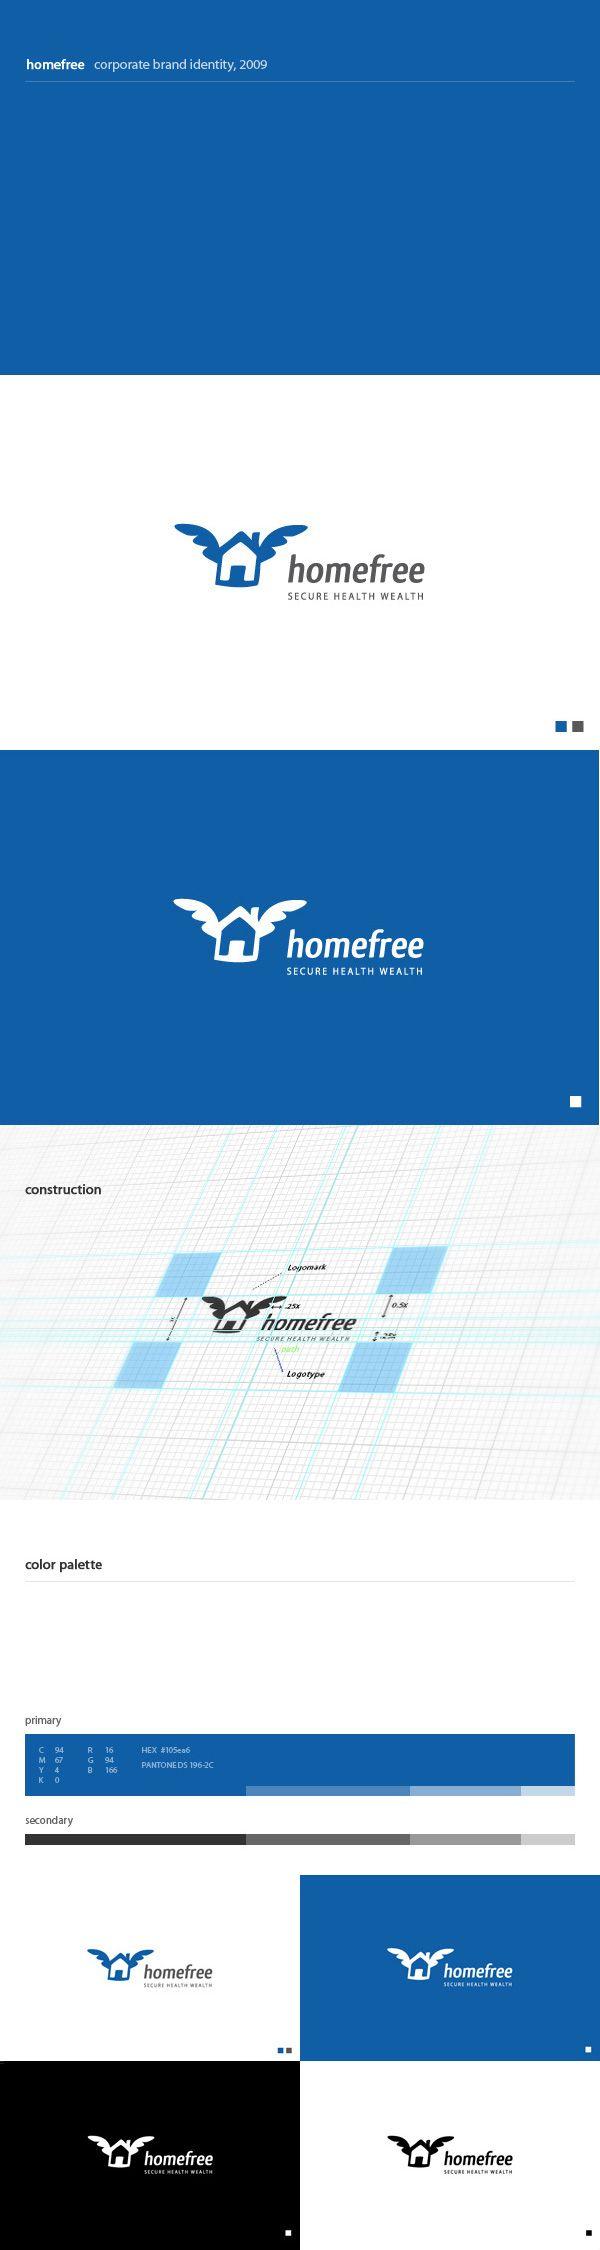 Logo design process for homefree